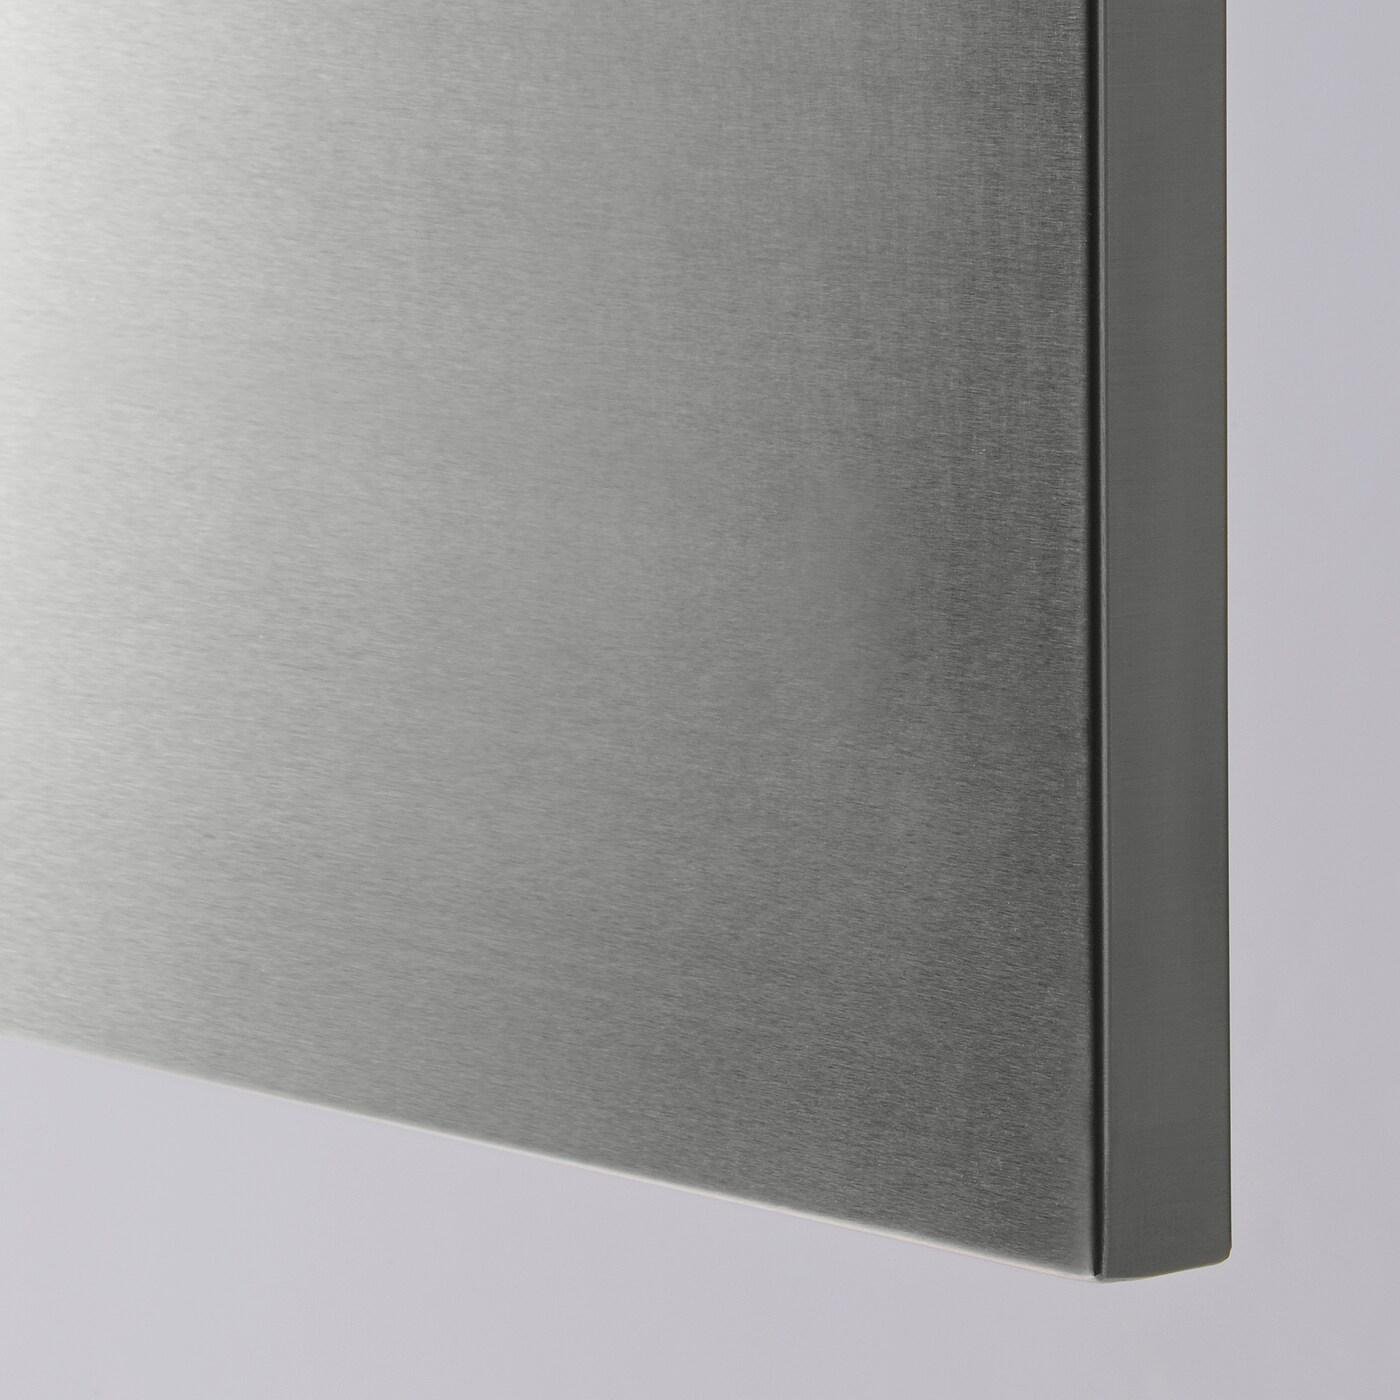 Pannelli Rivestimento Cucina Ikea grevsta door - stainless steel 40x80 cm